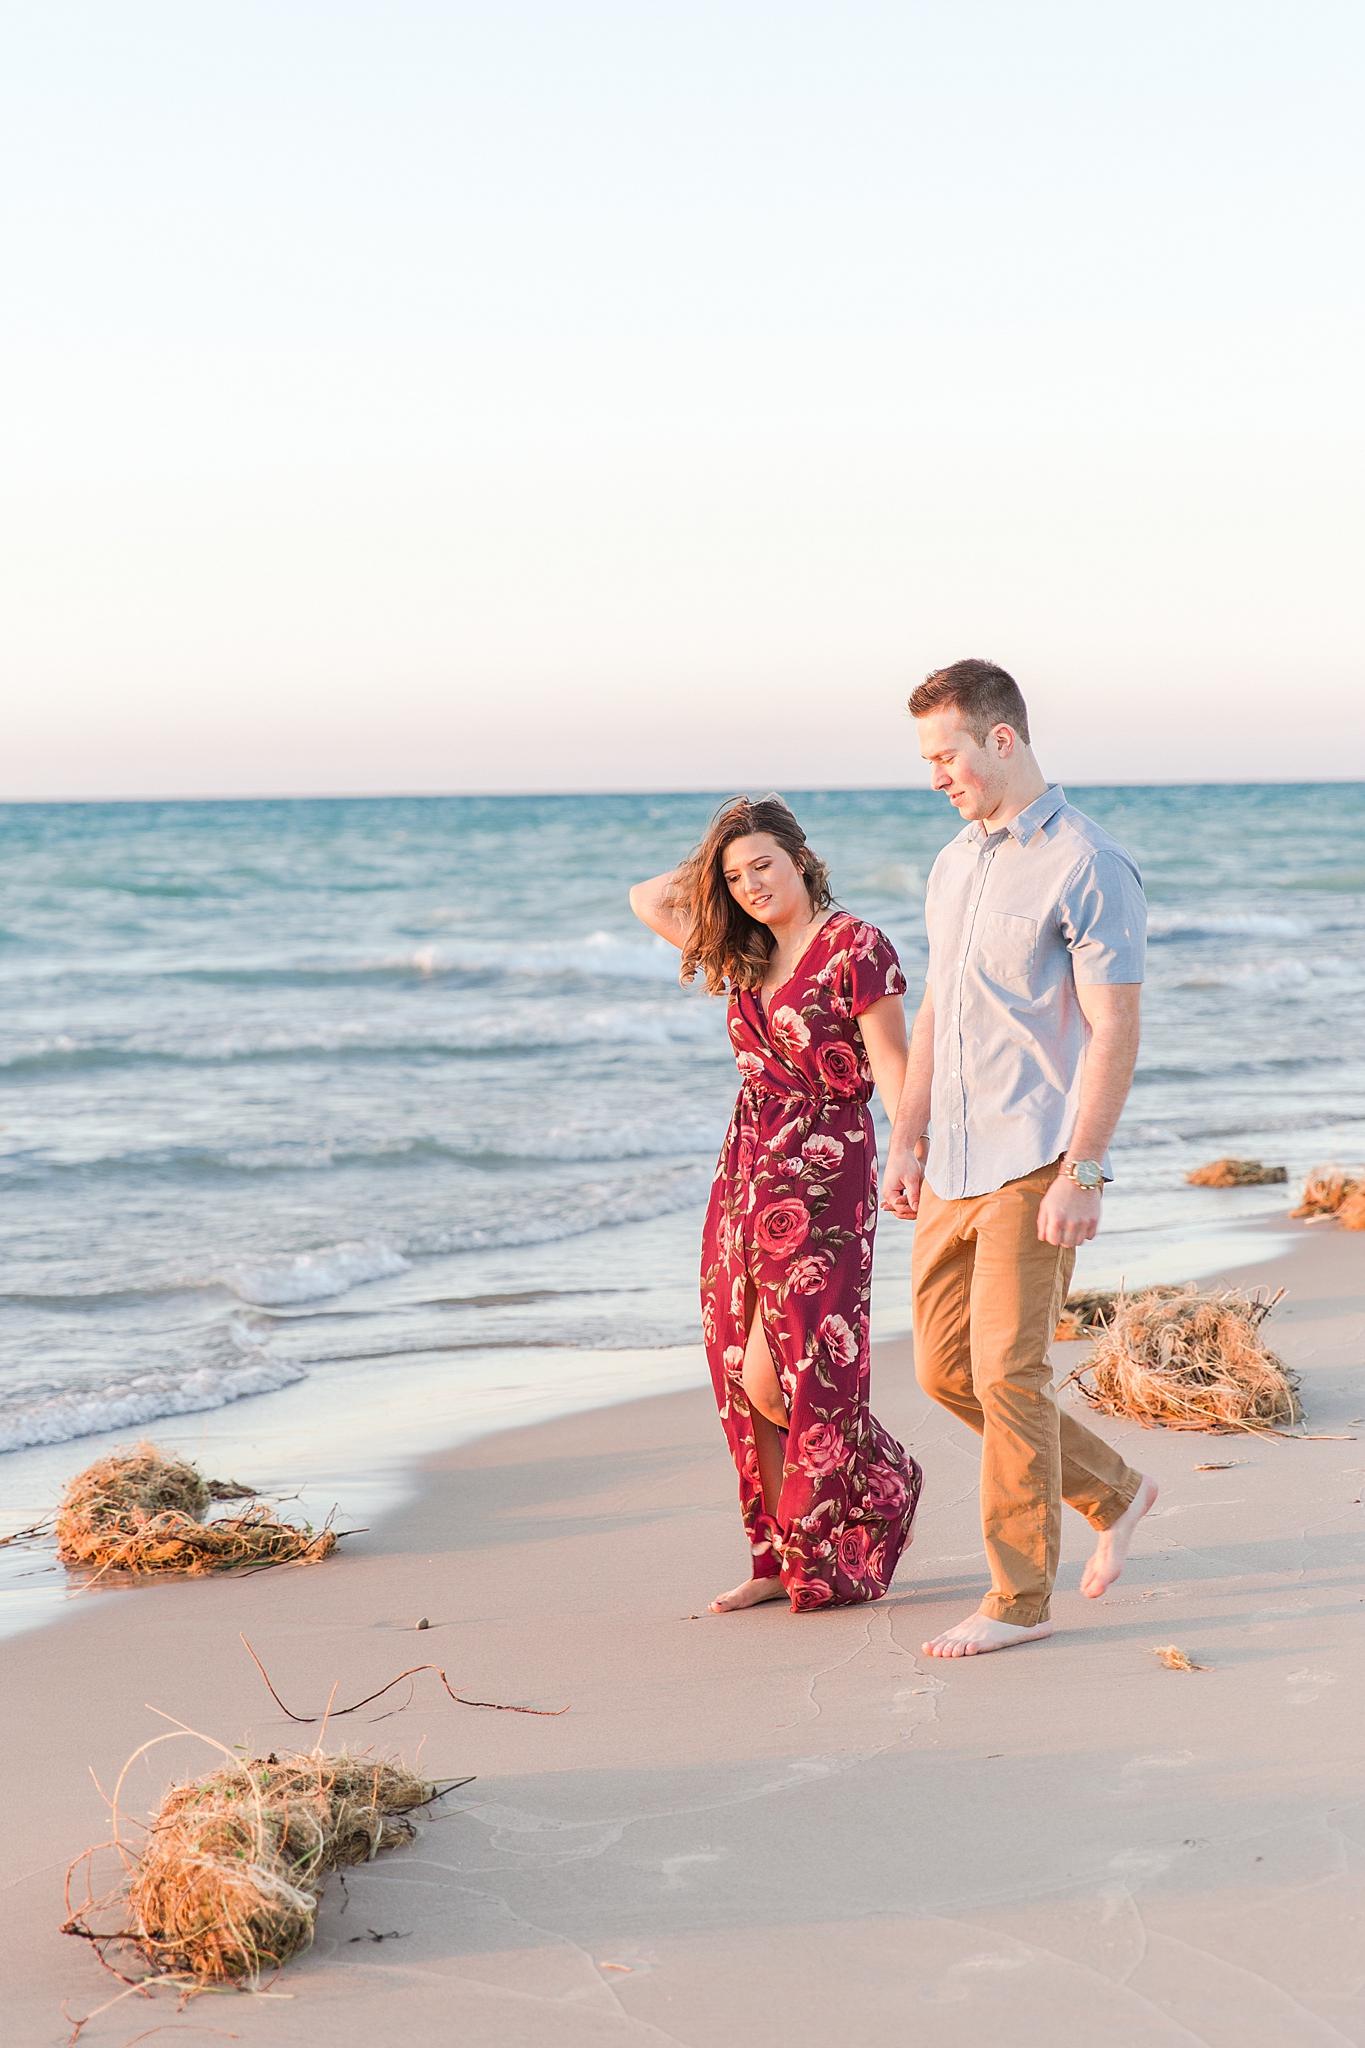 romantic--summer-beach-engagement-photography-in-st-joseph-mi-by-courtney-carolyn-photography_0017.jpg